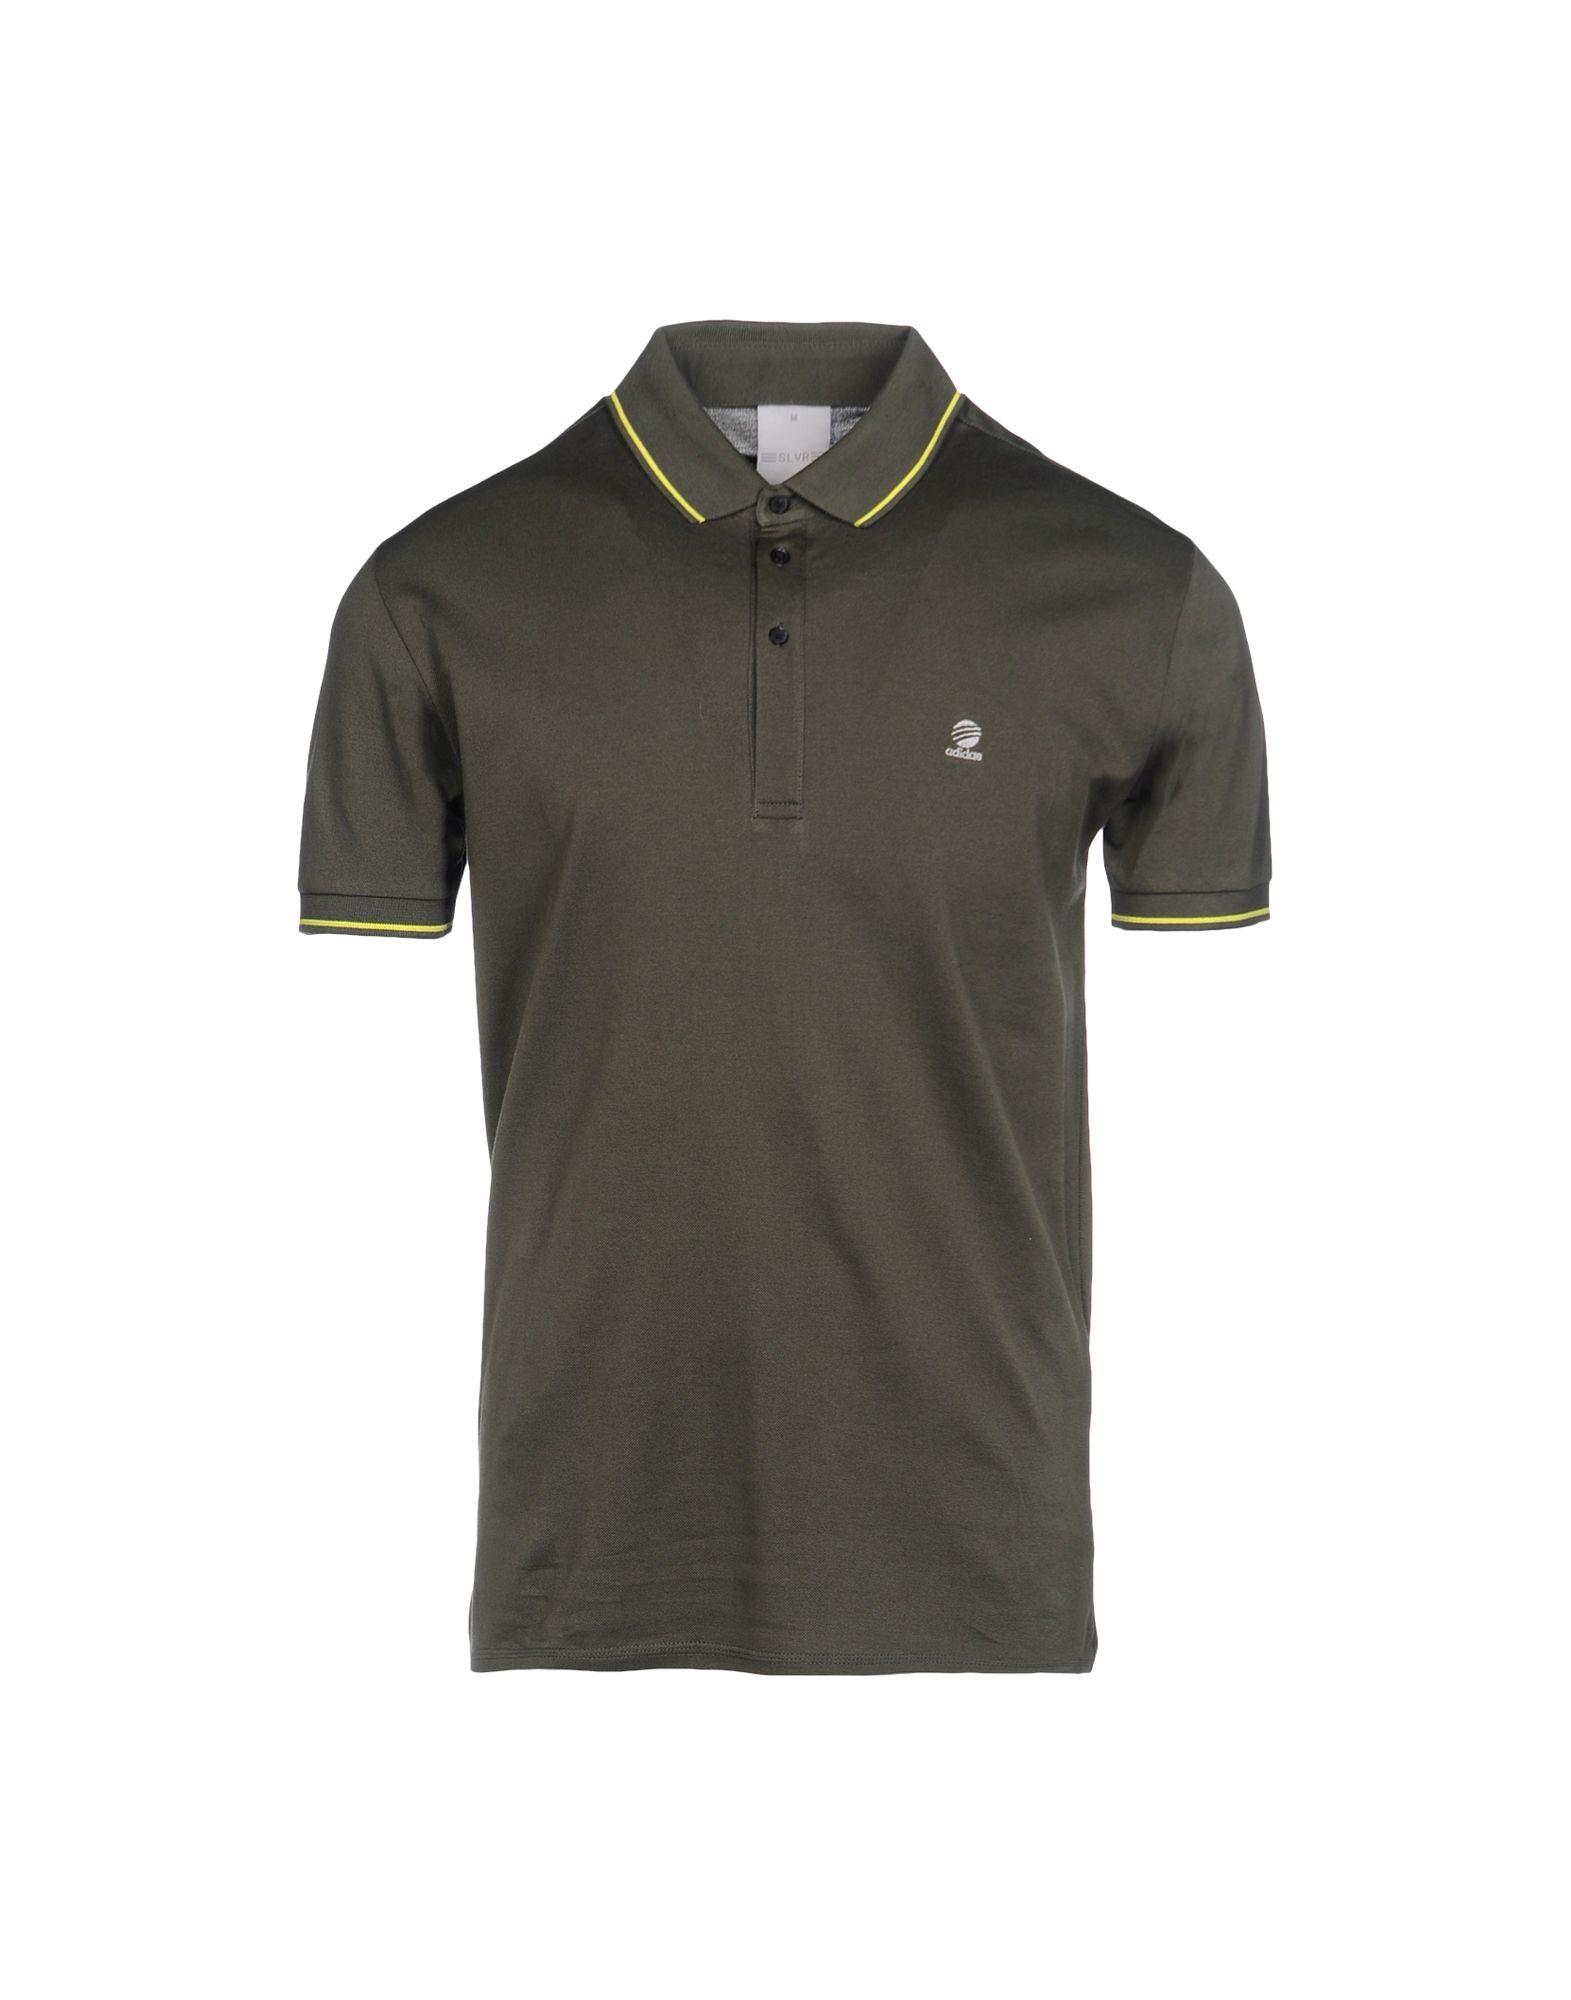 Adidas slvr polo shirt in khaki for men dark green lyst for Dark green mens polo shirt